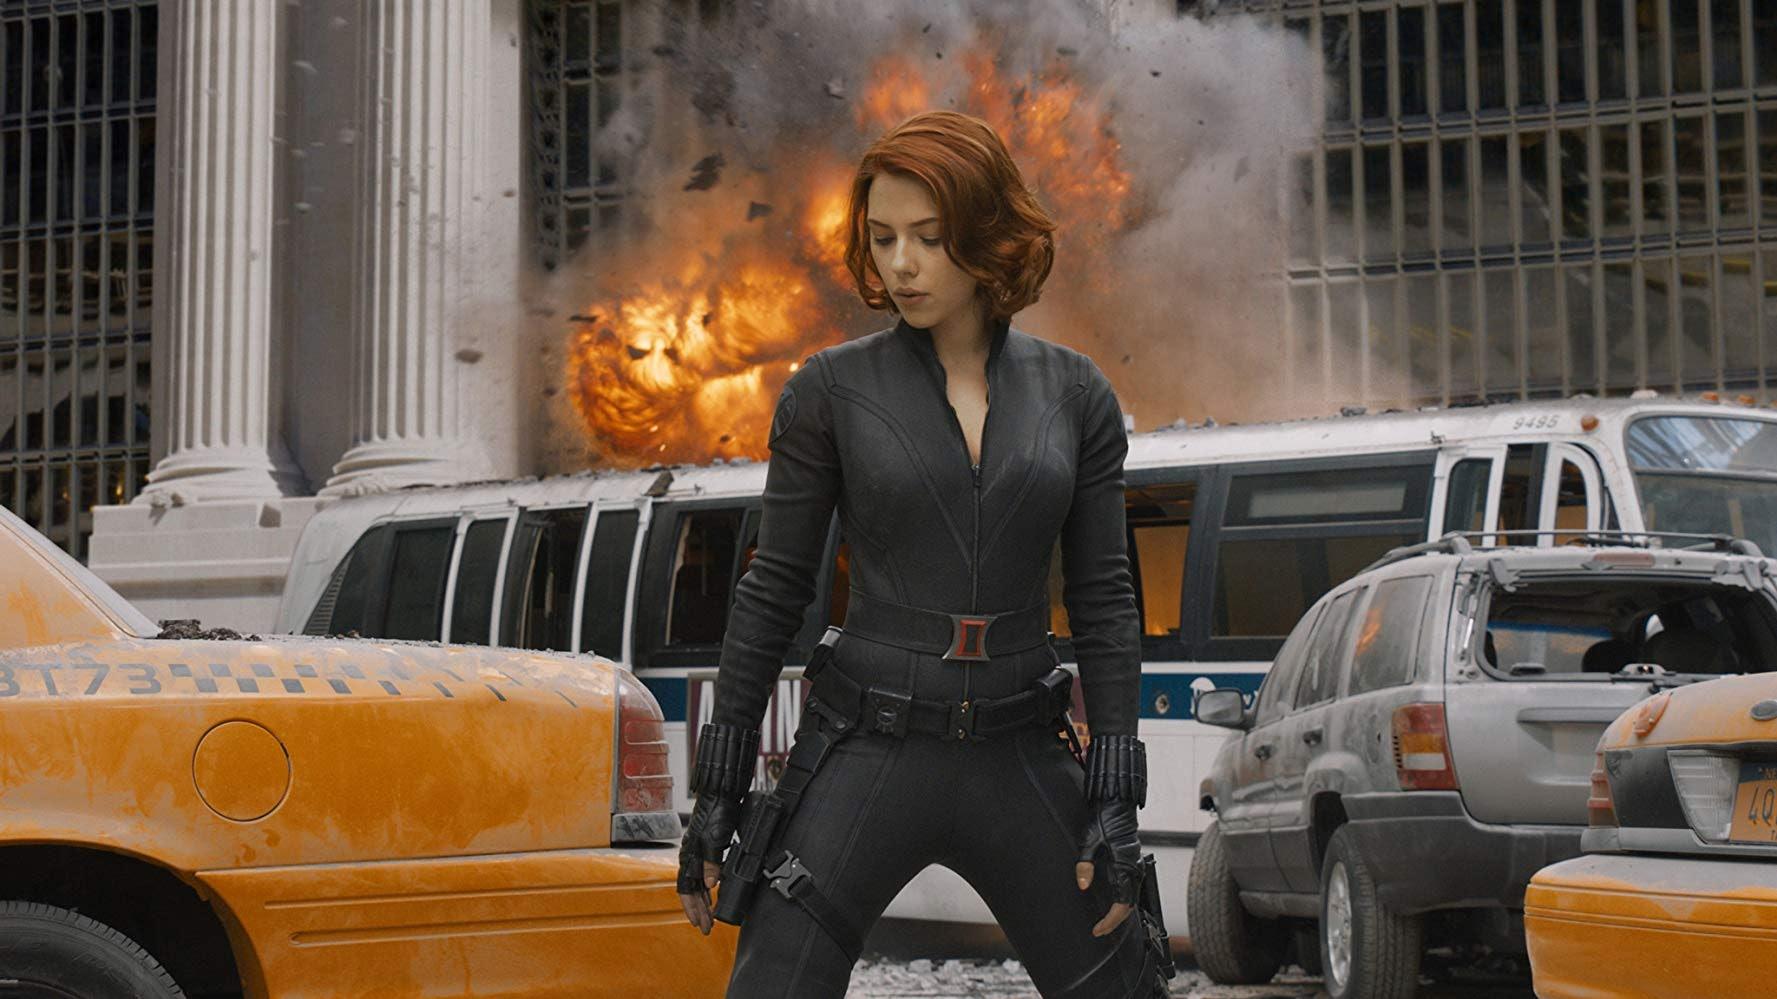 Natasha Romanoff as Black Widow in 'Marvel's The Avengers'